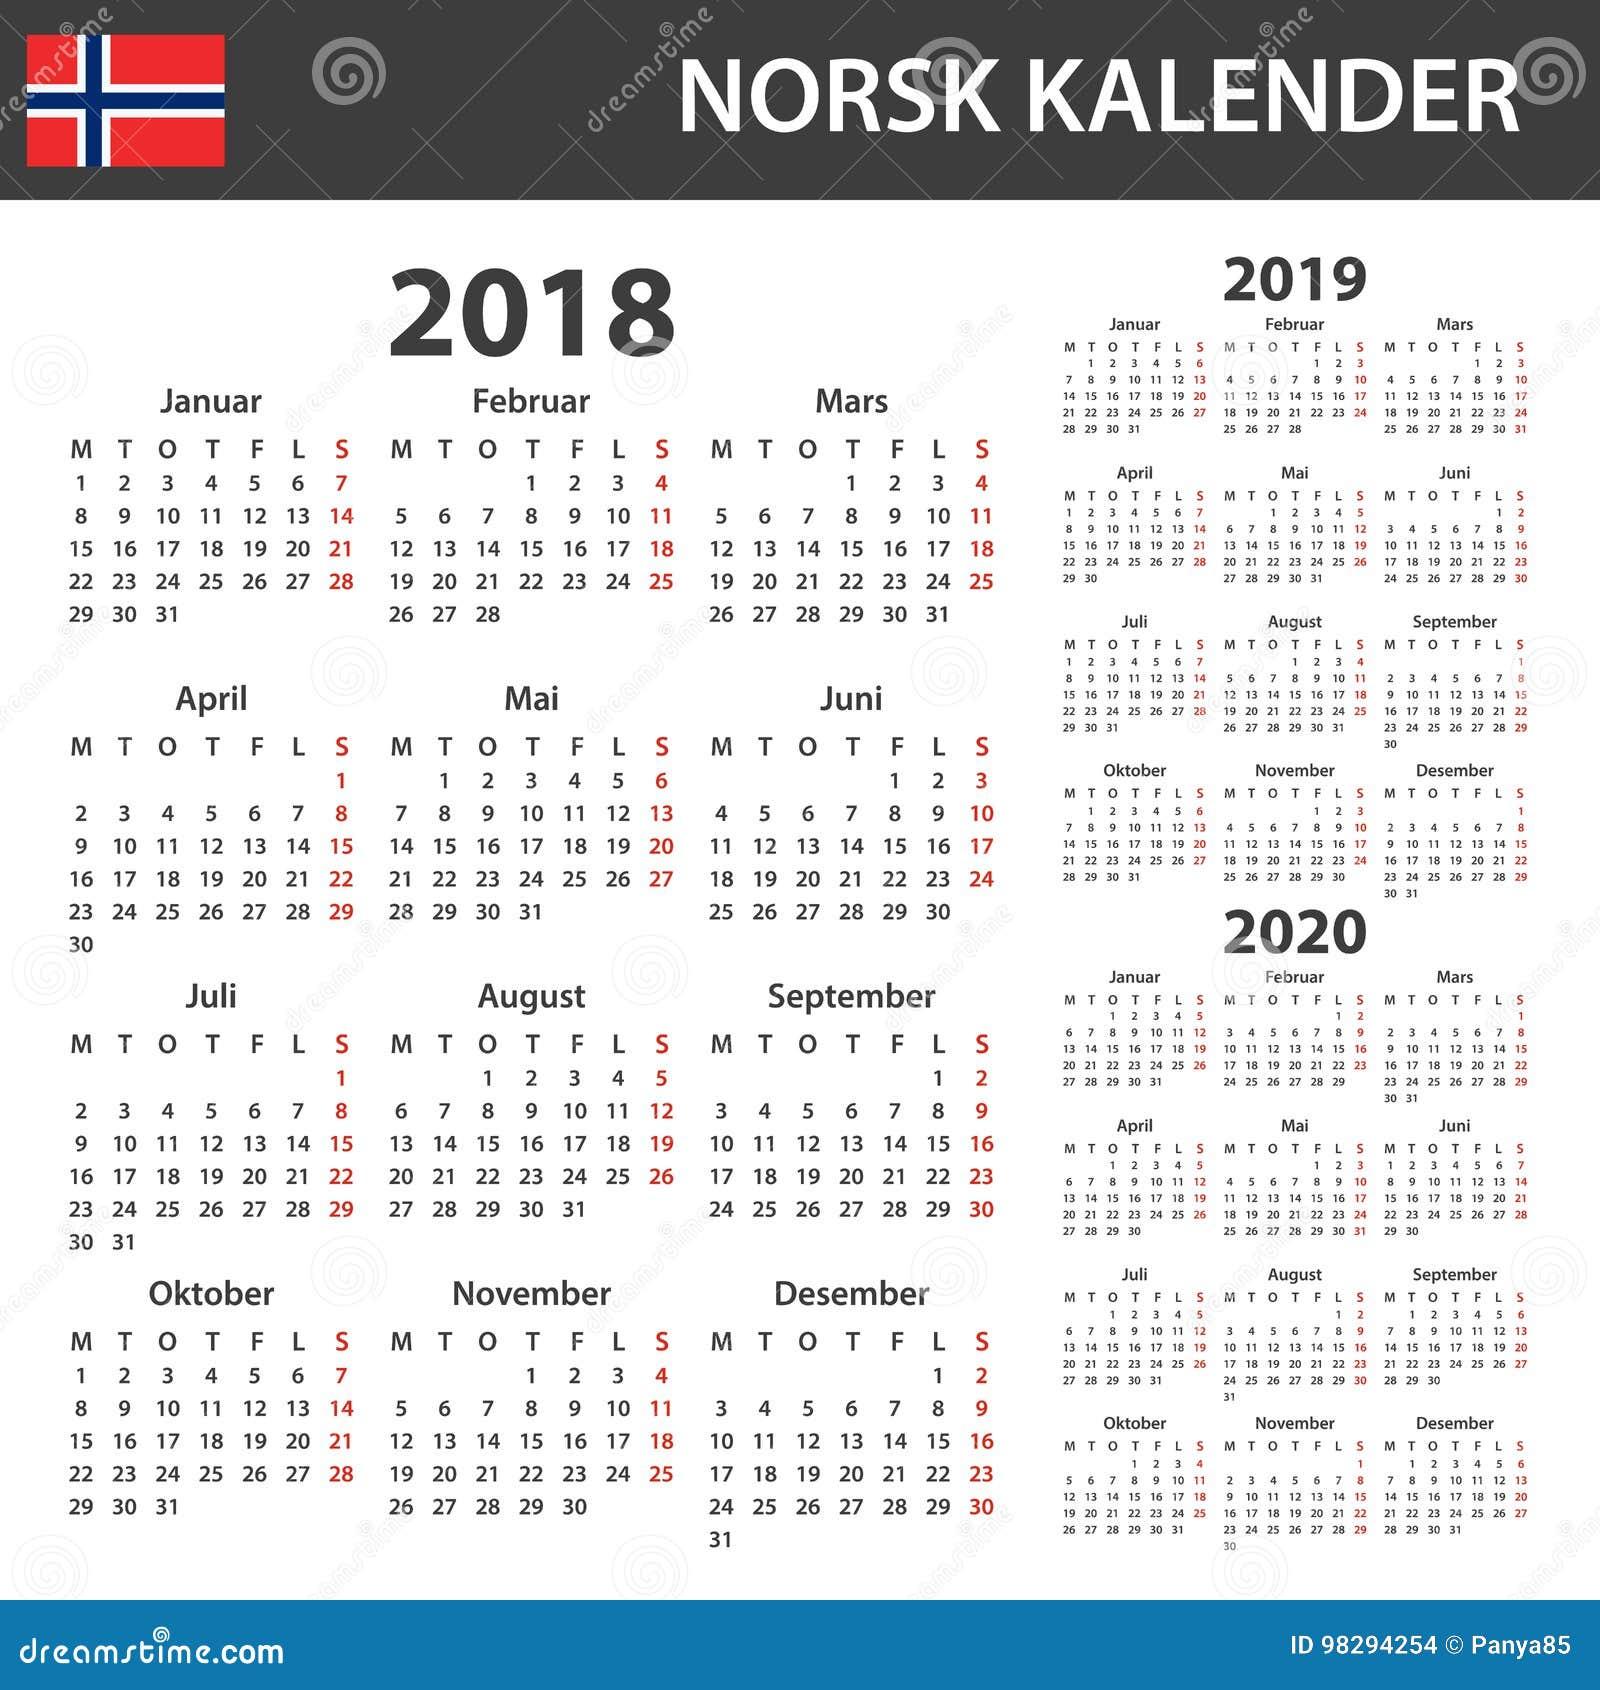 norwegian calendar for 2018 2019 and 2020 scheduler. Black Bedroom Furniture Sets. Home Design Ideas